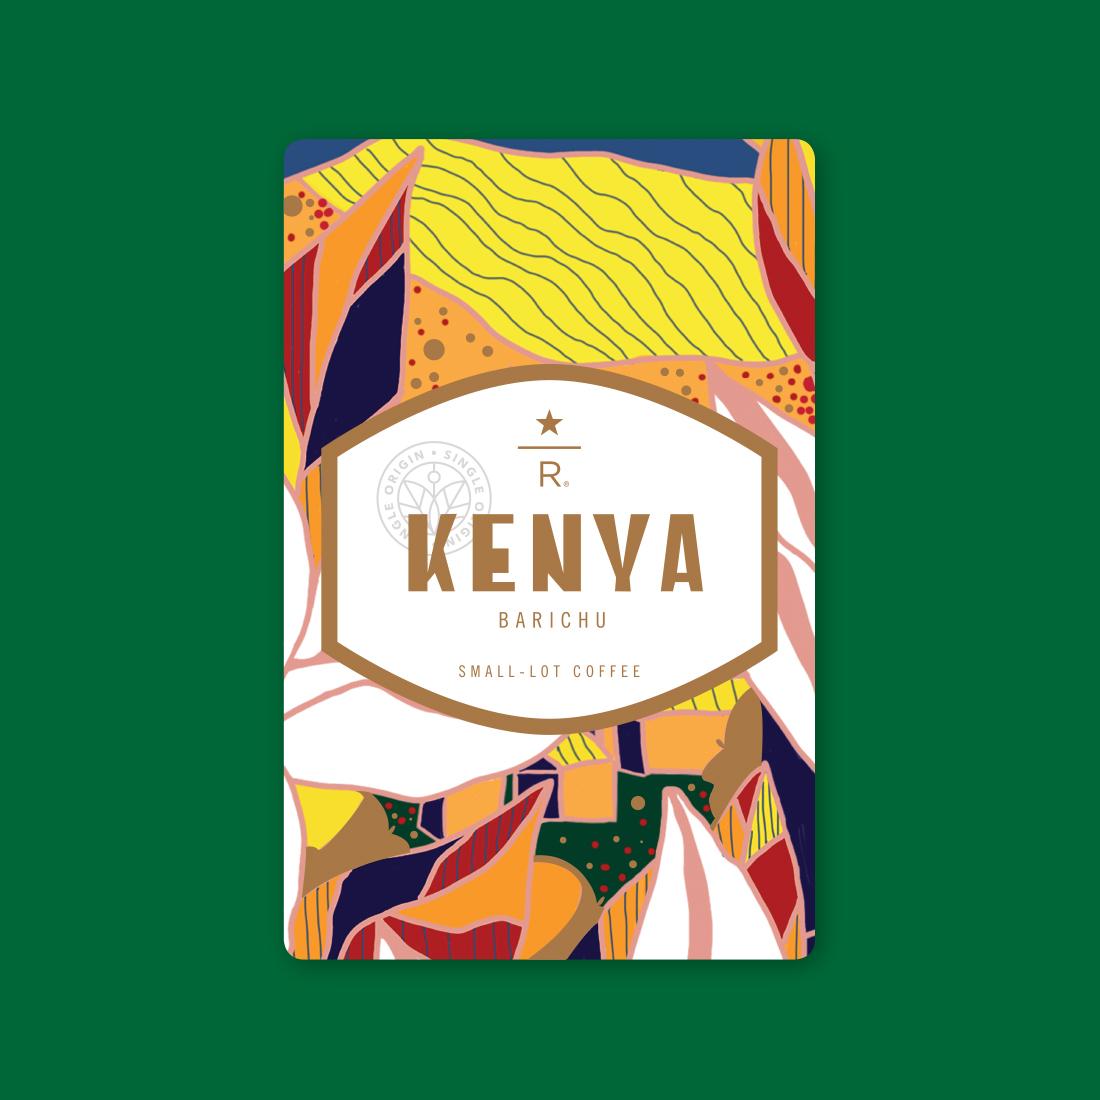 Coffee card illustration for KENYA BARICHU